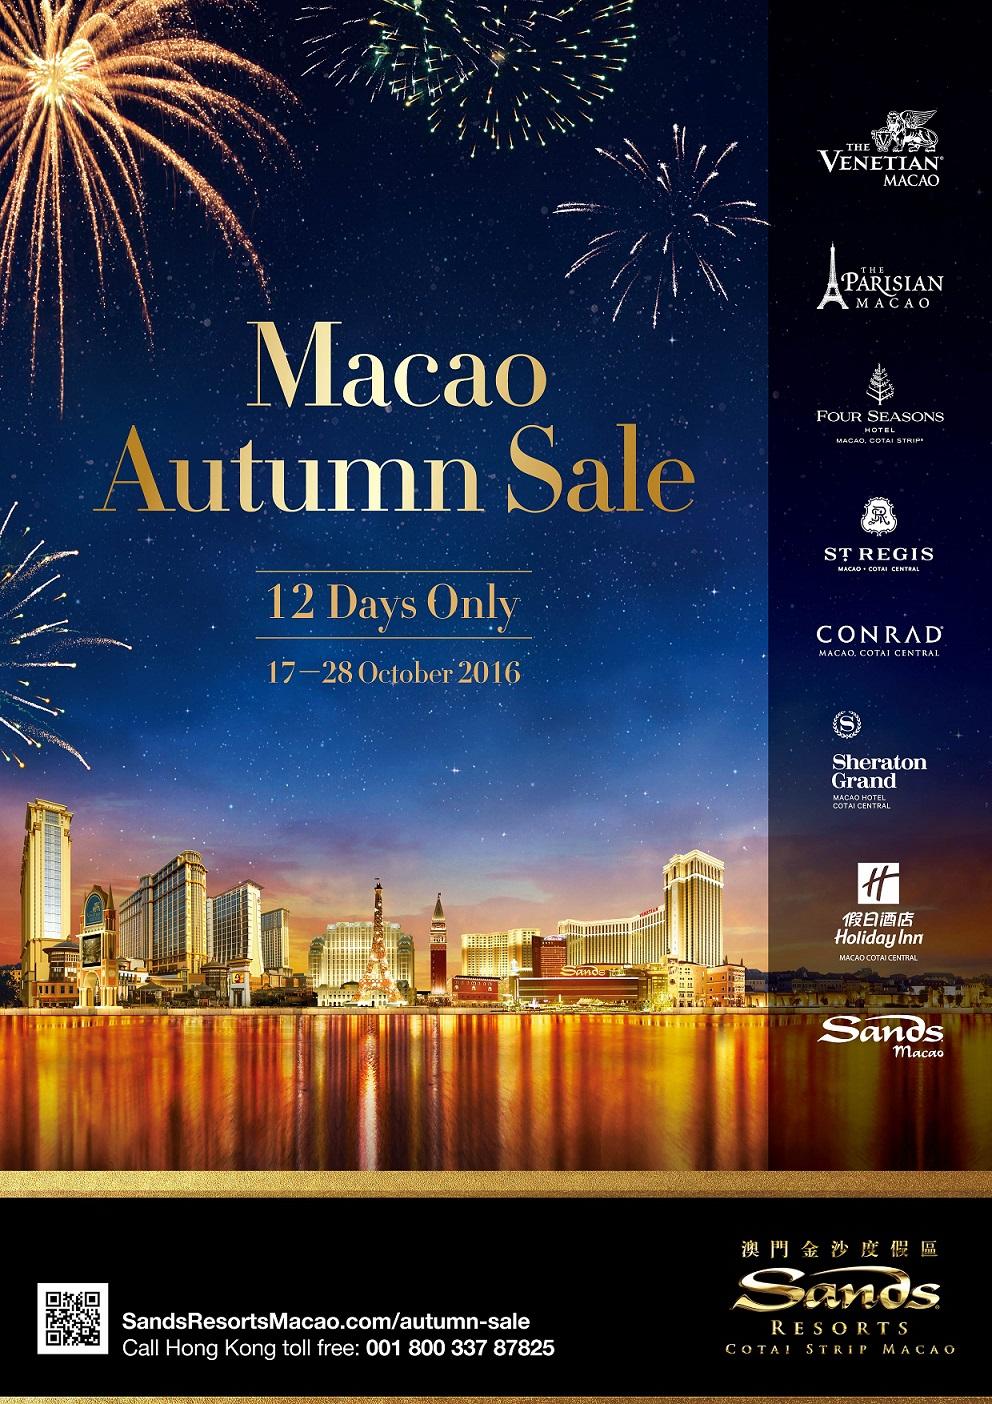 Sands Resorts Cotai Strip Macao Autumn Sale